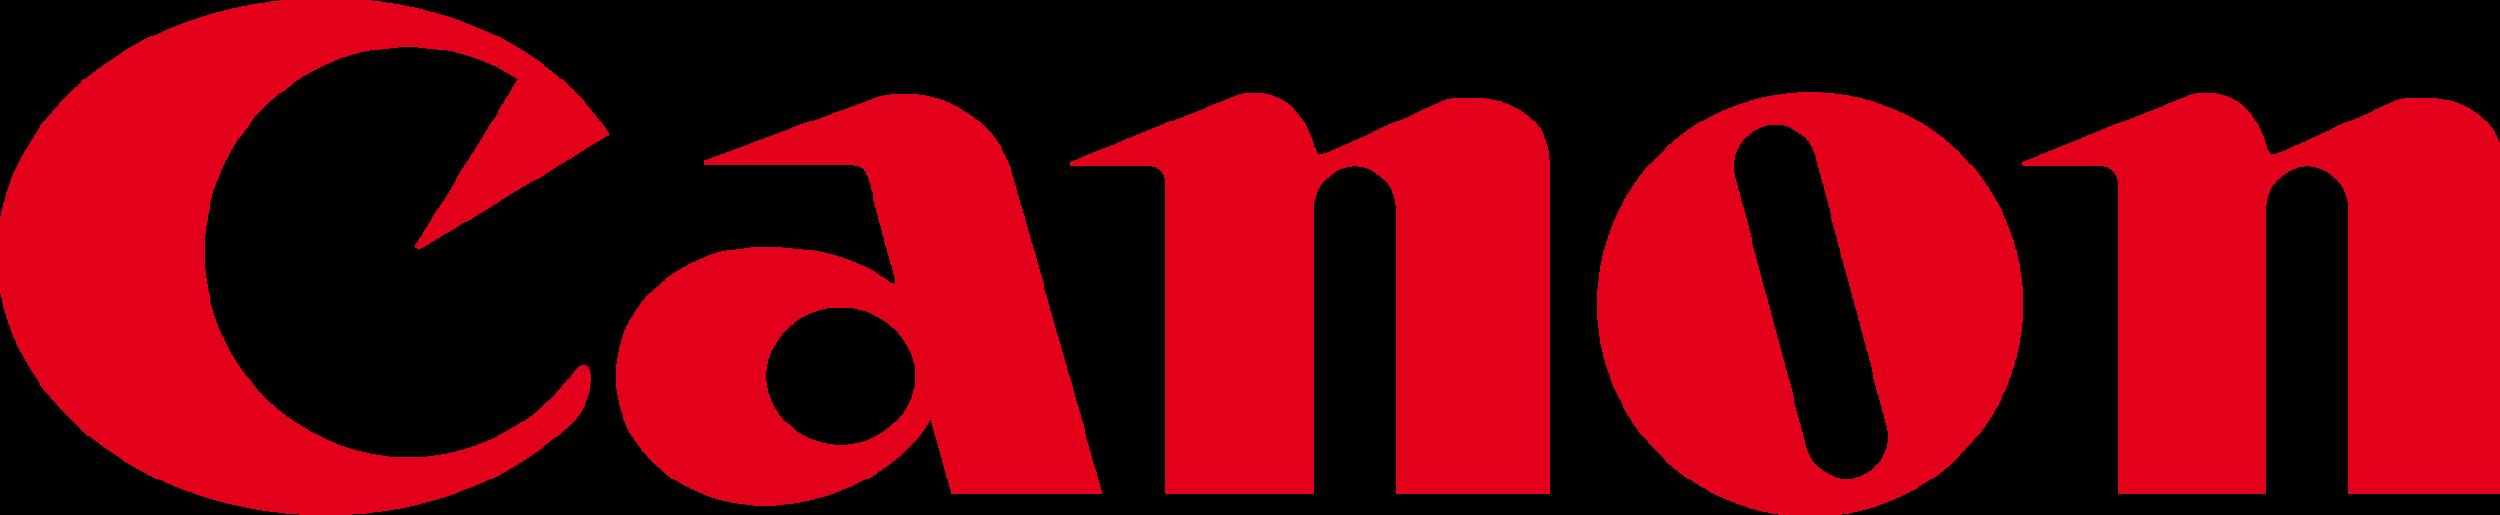 Canon-logo-canon-digital-slr-24104073-2560-527.png